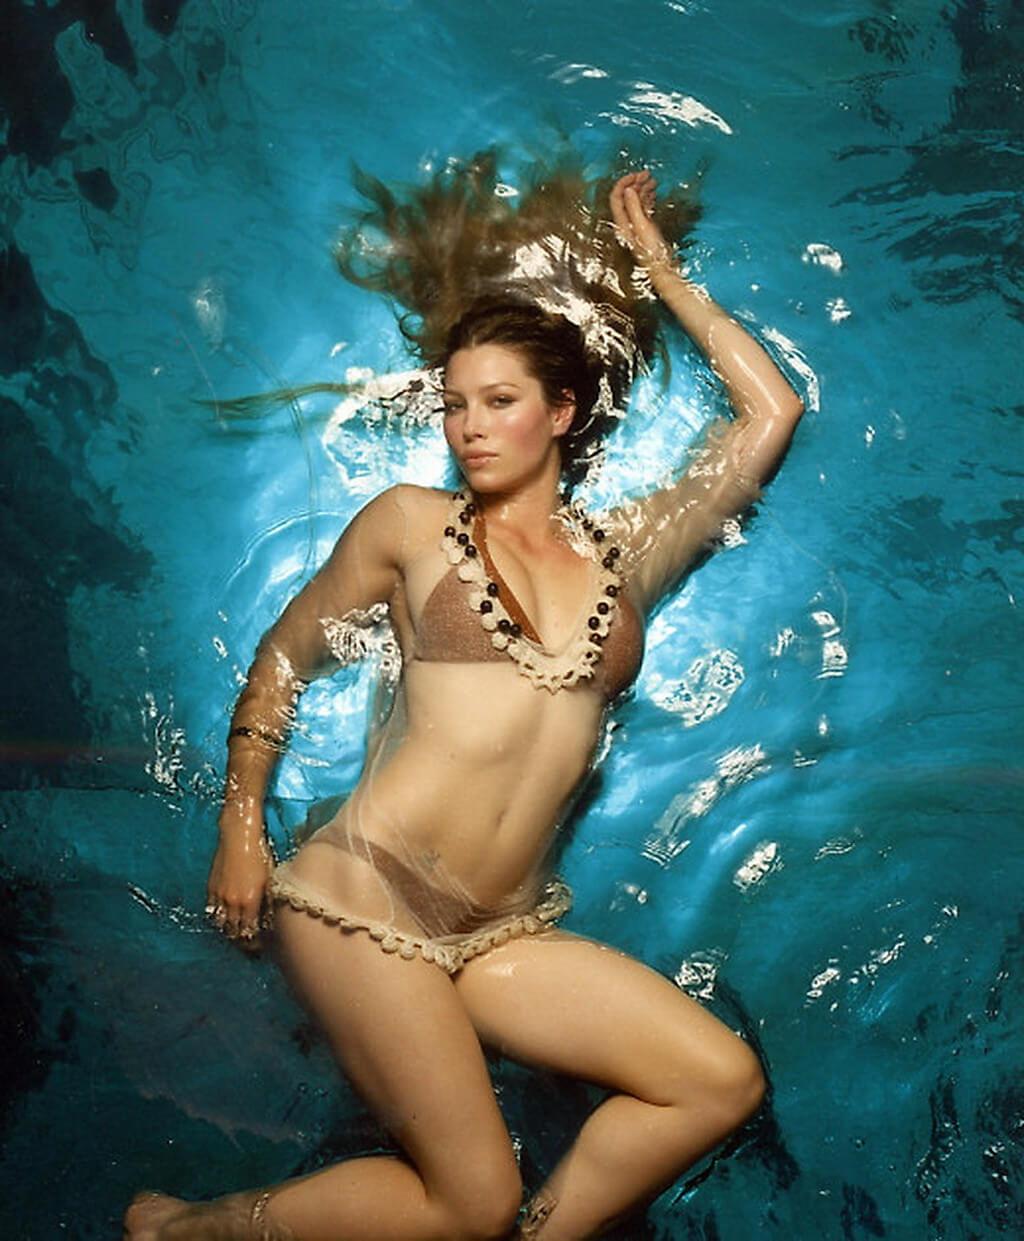 Jessica Biel sexy bikini pic